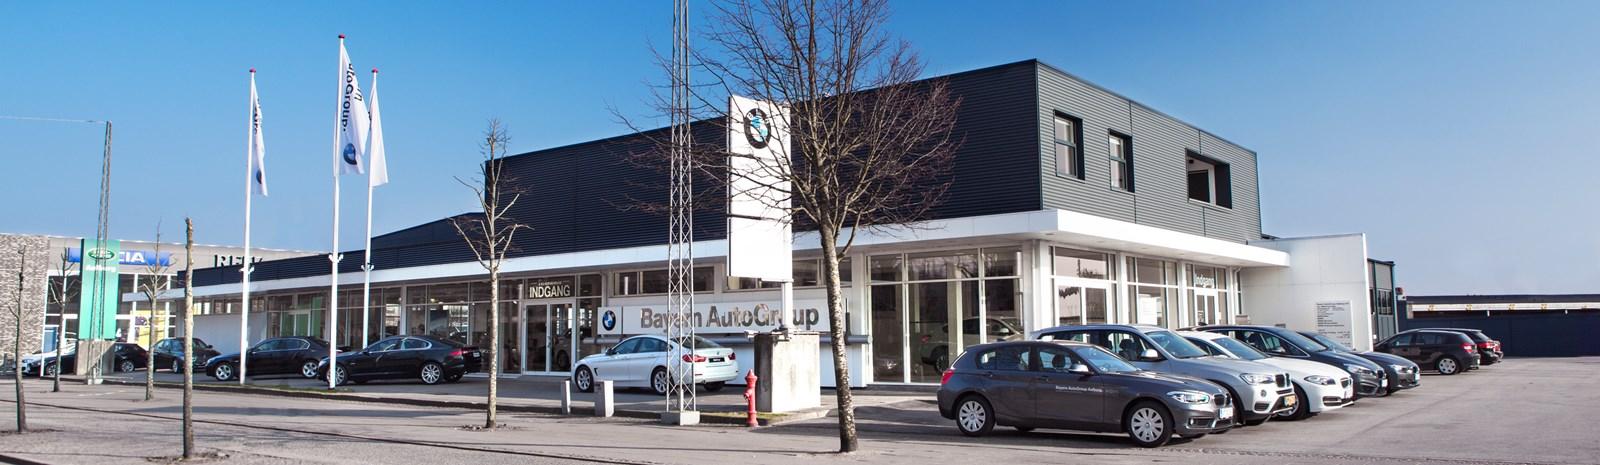 Aalborg Facade 3100X1330